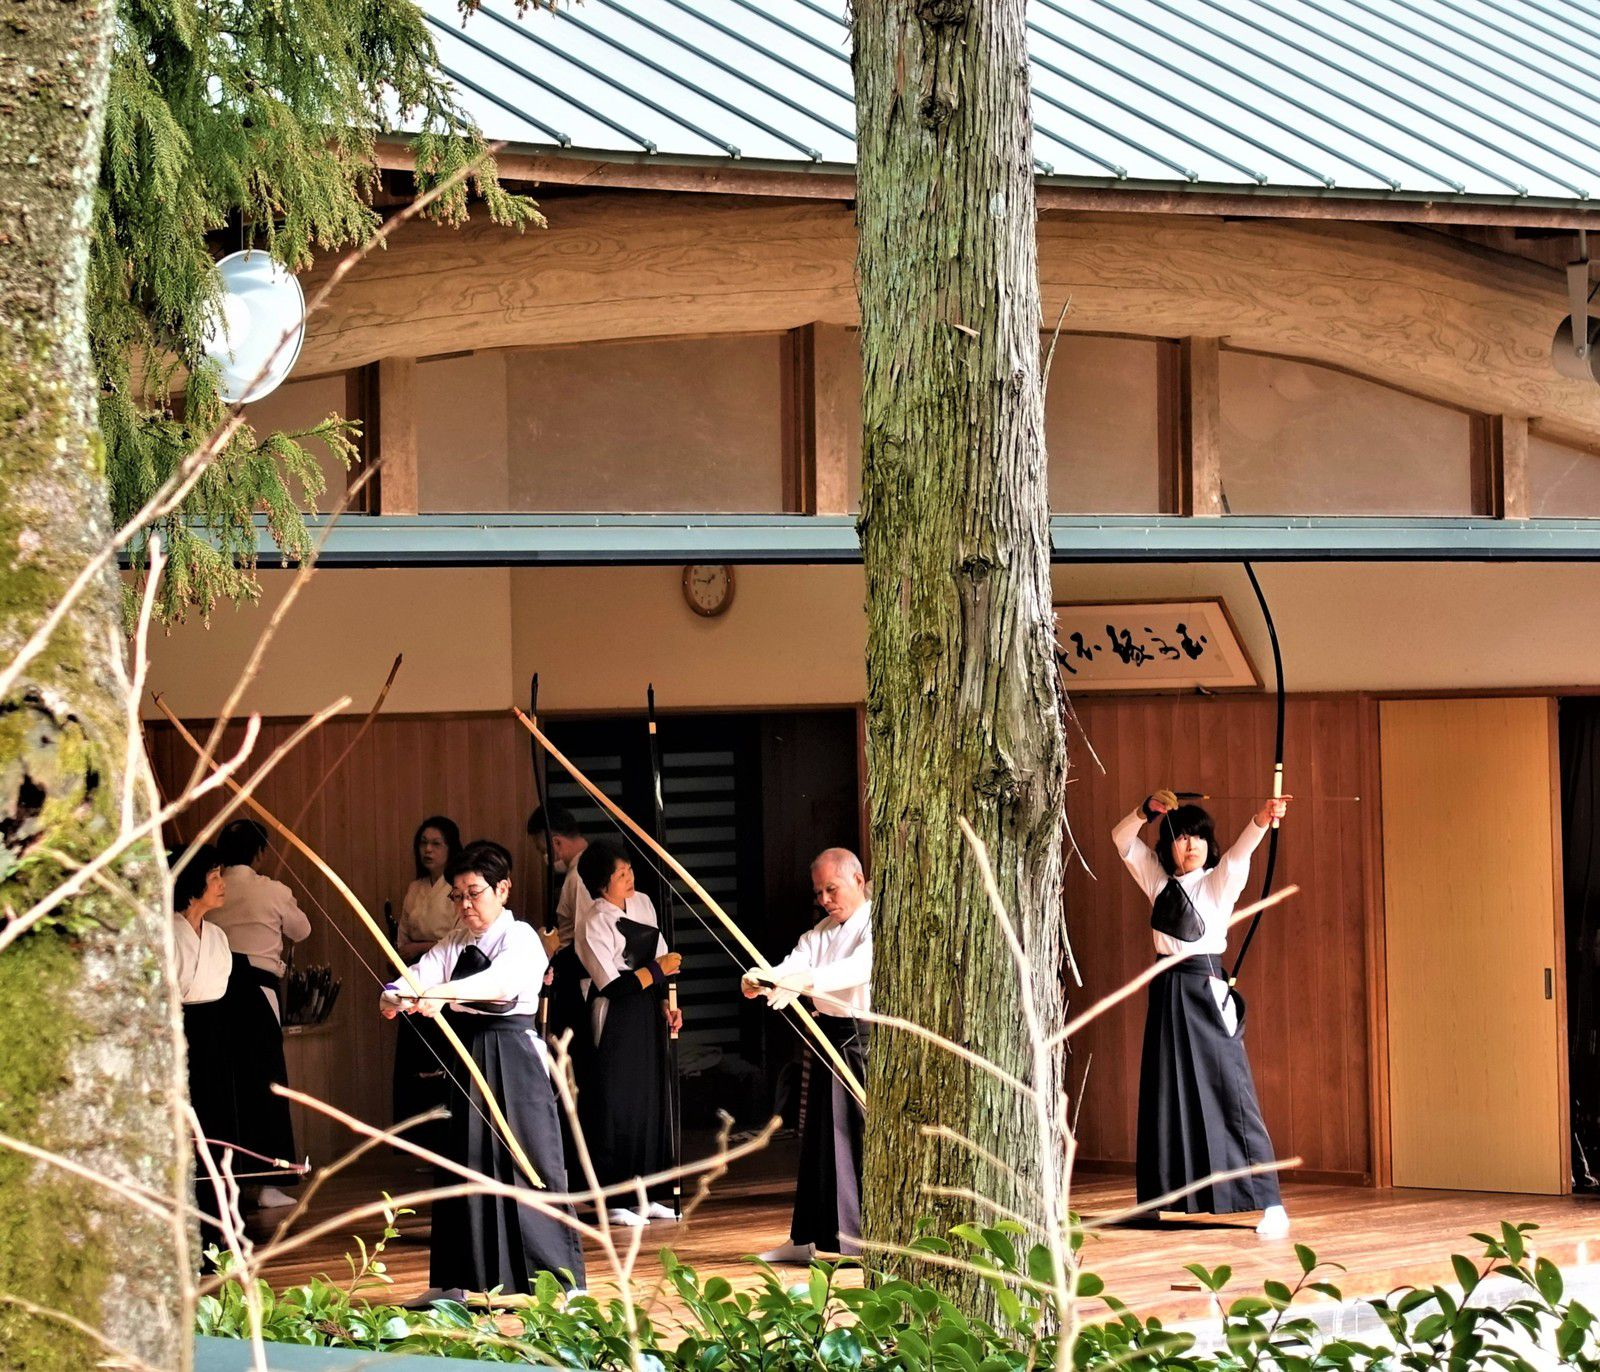 Le sanctuaire: Tsubaki Ookami Yashiro